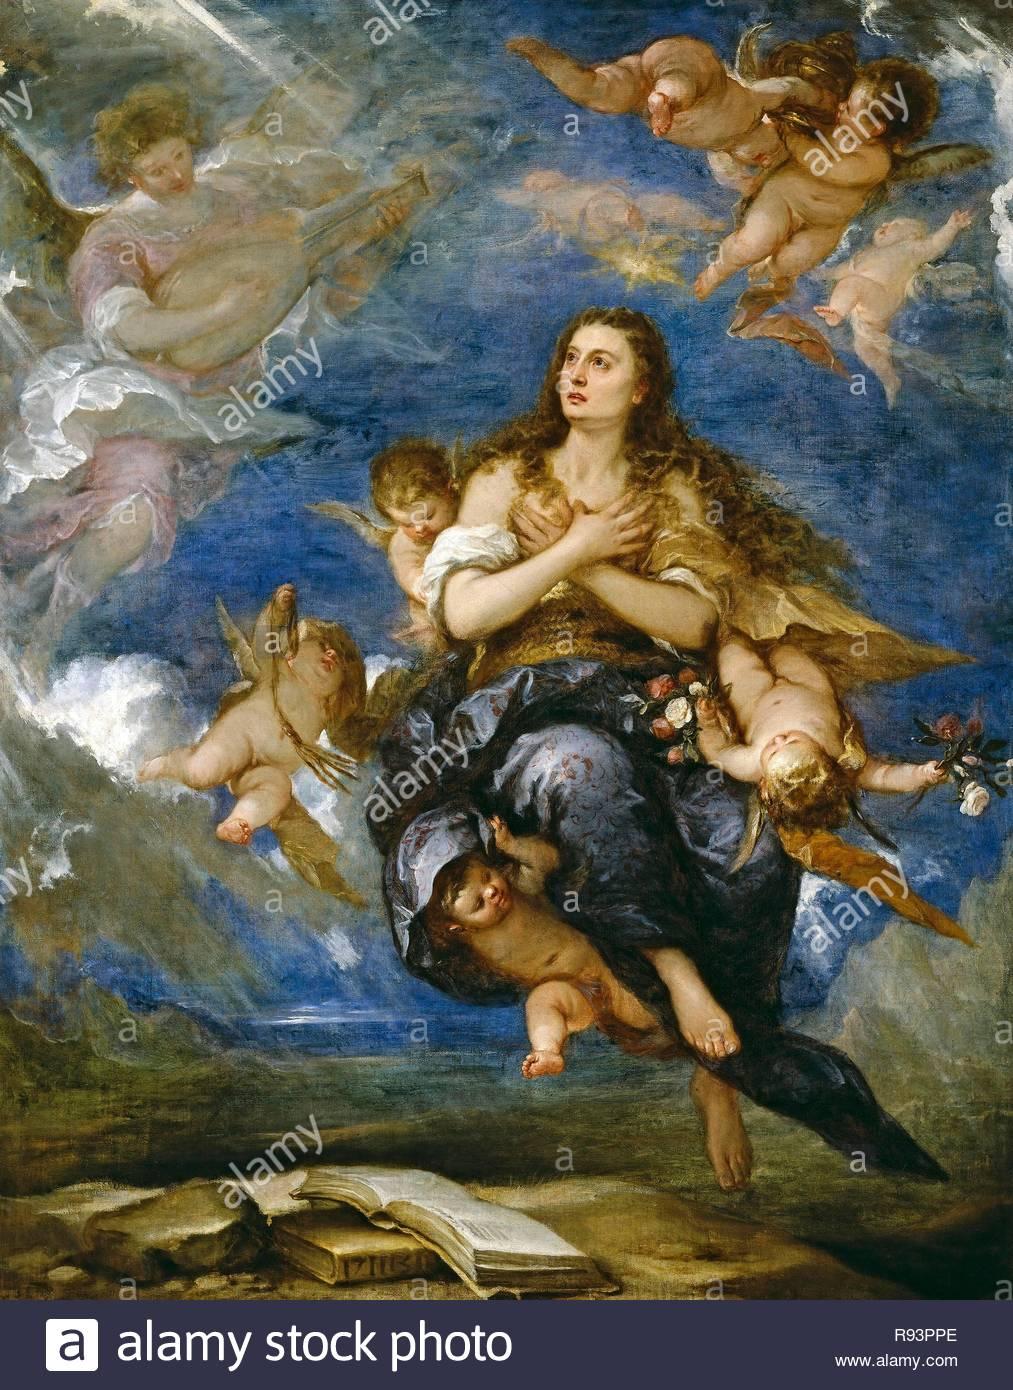 José Antolínez / 'The Death of Mary Magdelene', ca.  1672, Spanish School, Oil on canvas, 205 cm x 163 cm, P00591. Museum: MUSEO DEL PRADO. - Stock Image